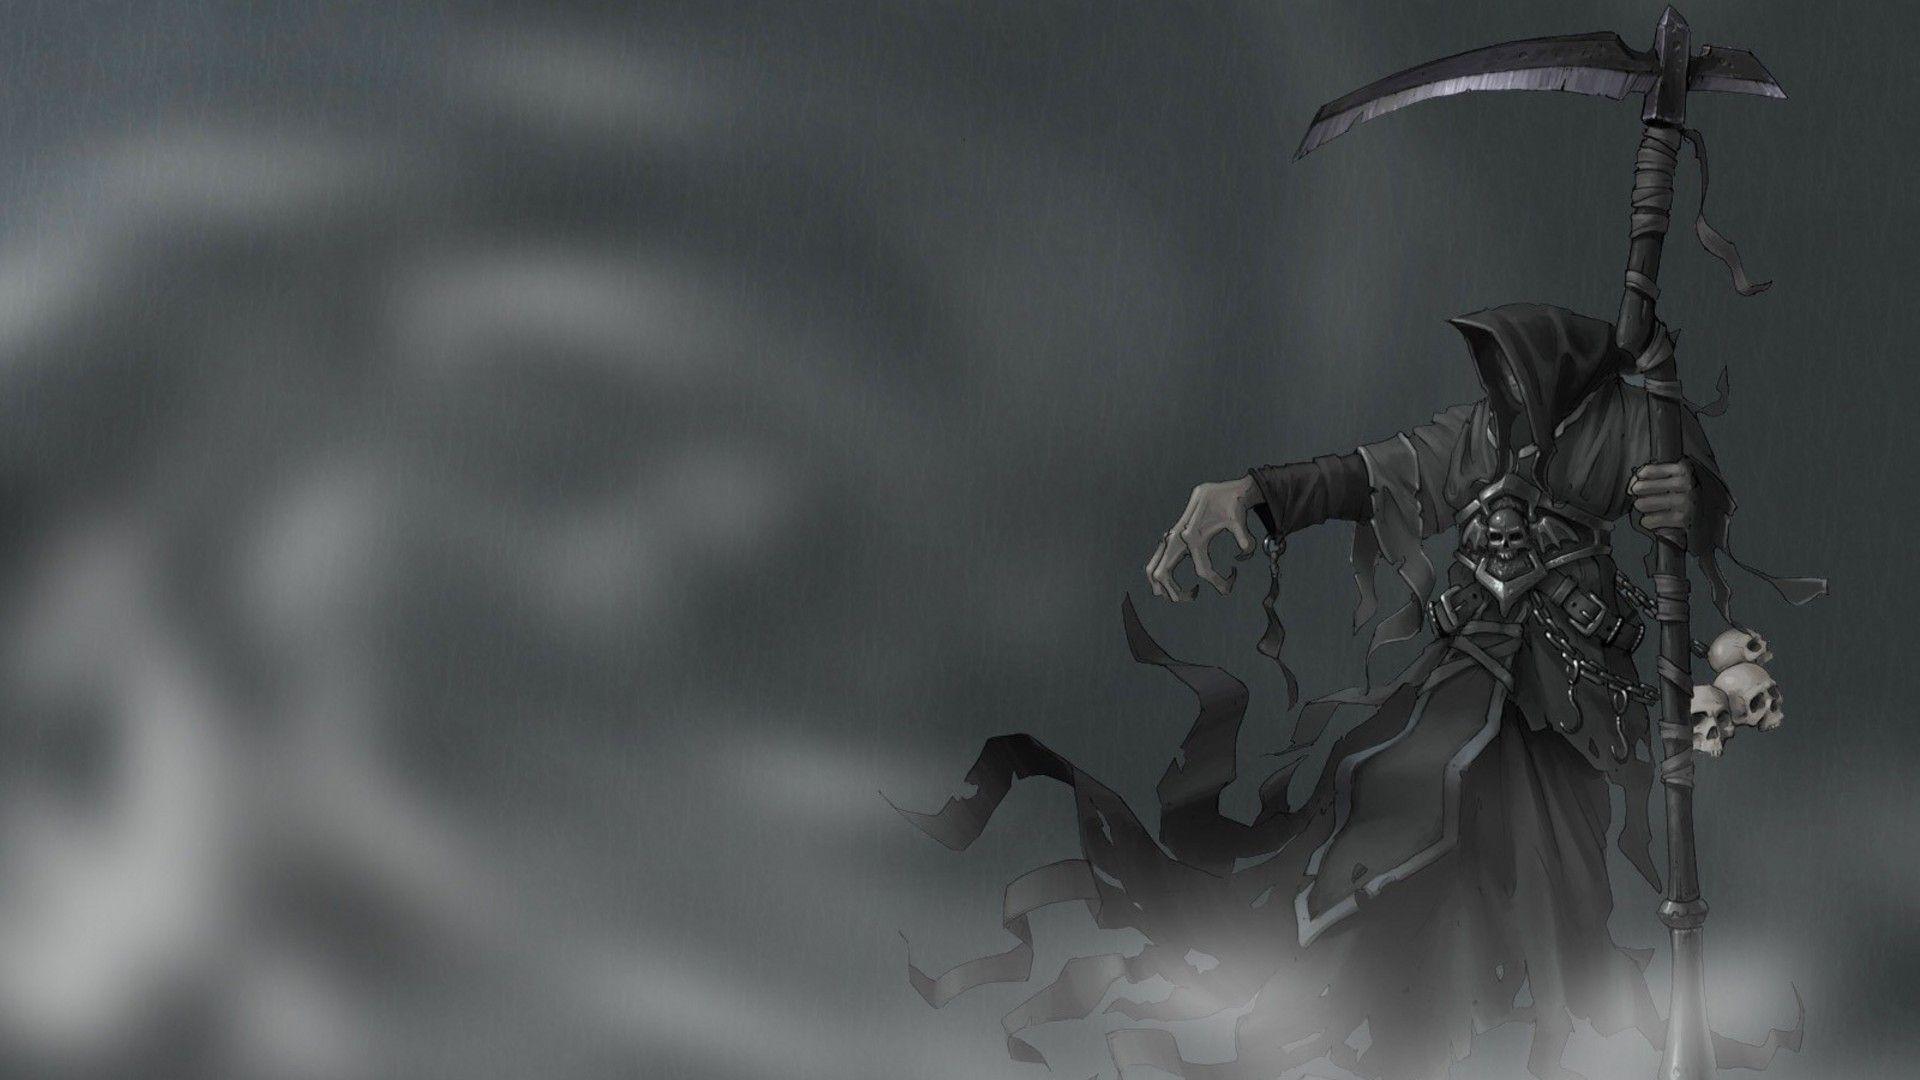 Grim reaper desktop backgrounds wallpaper cave - Reaper wallpaper ...